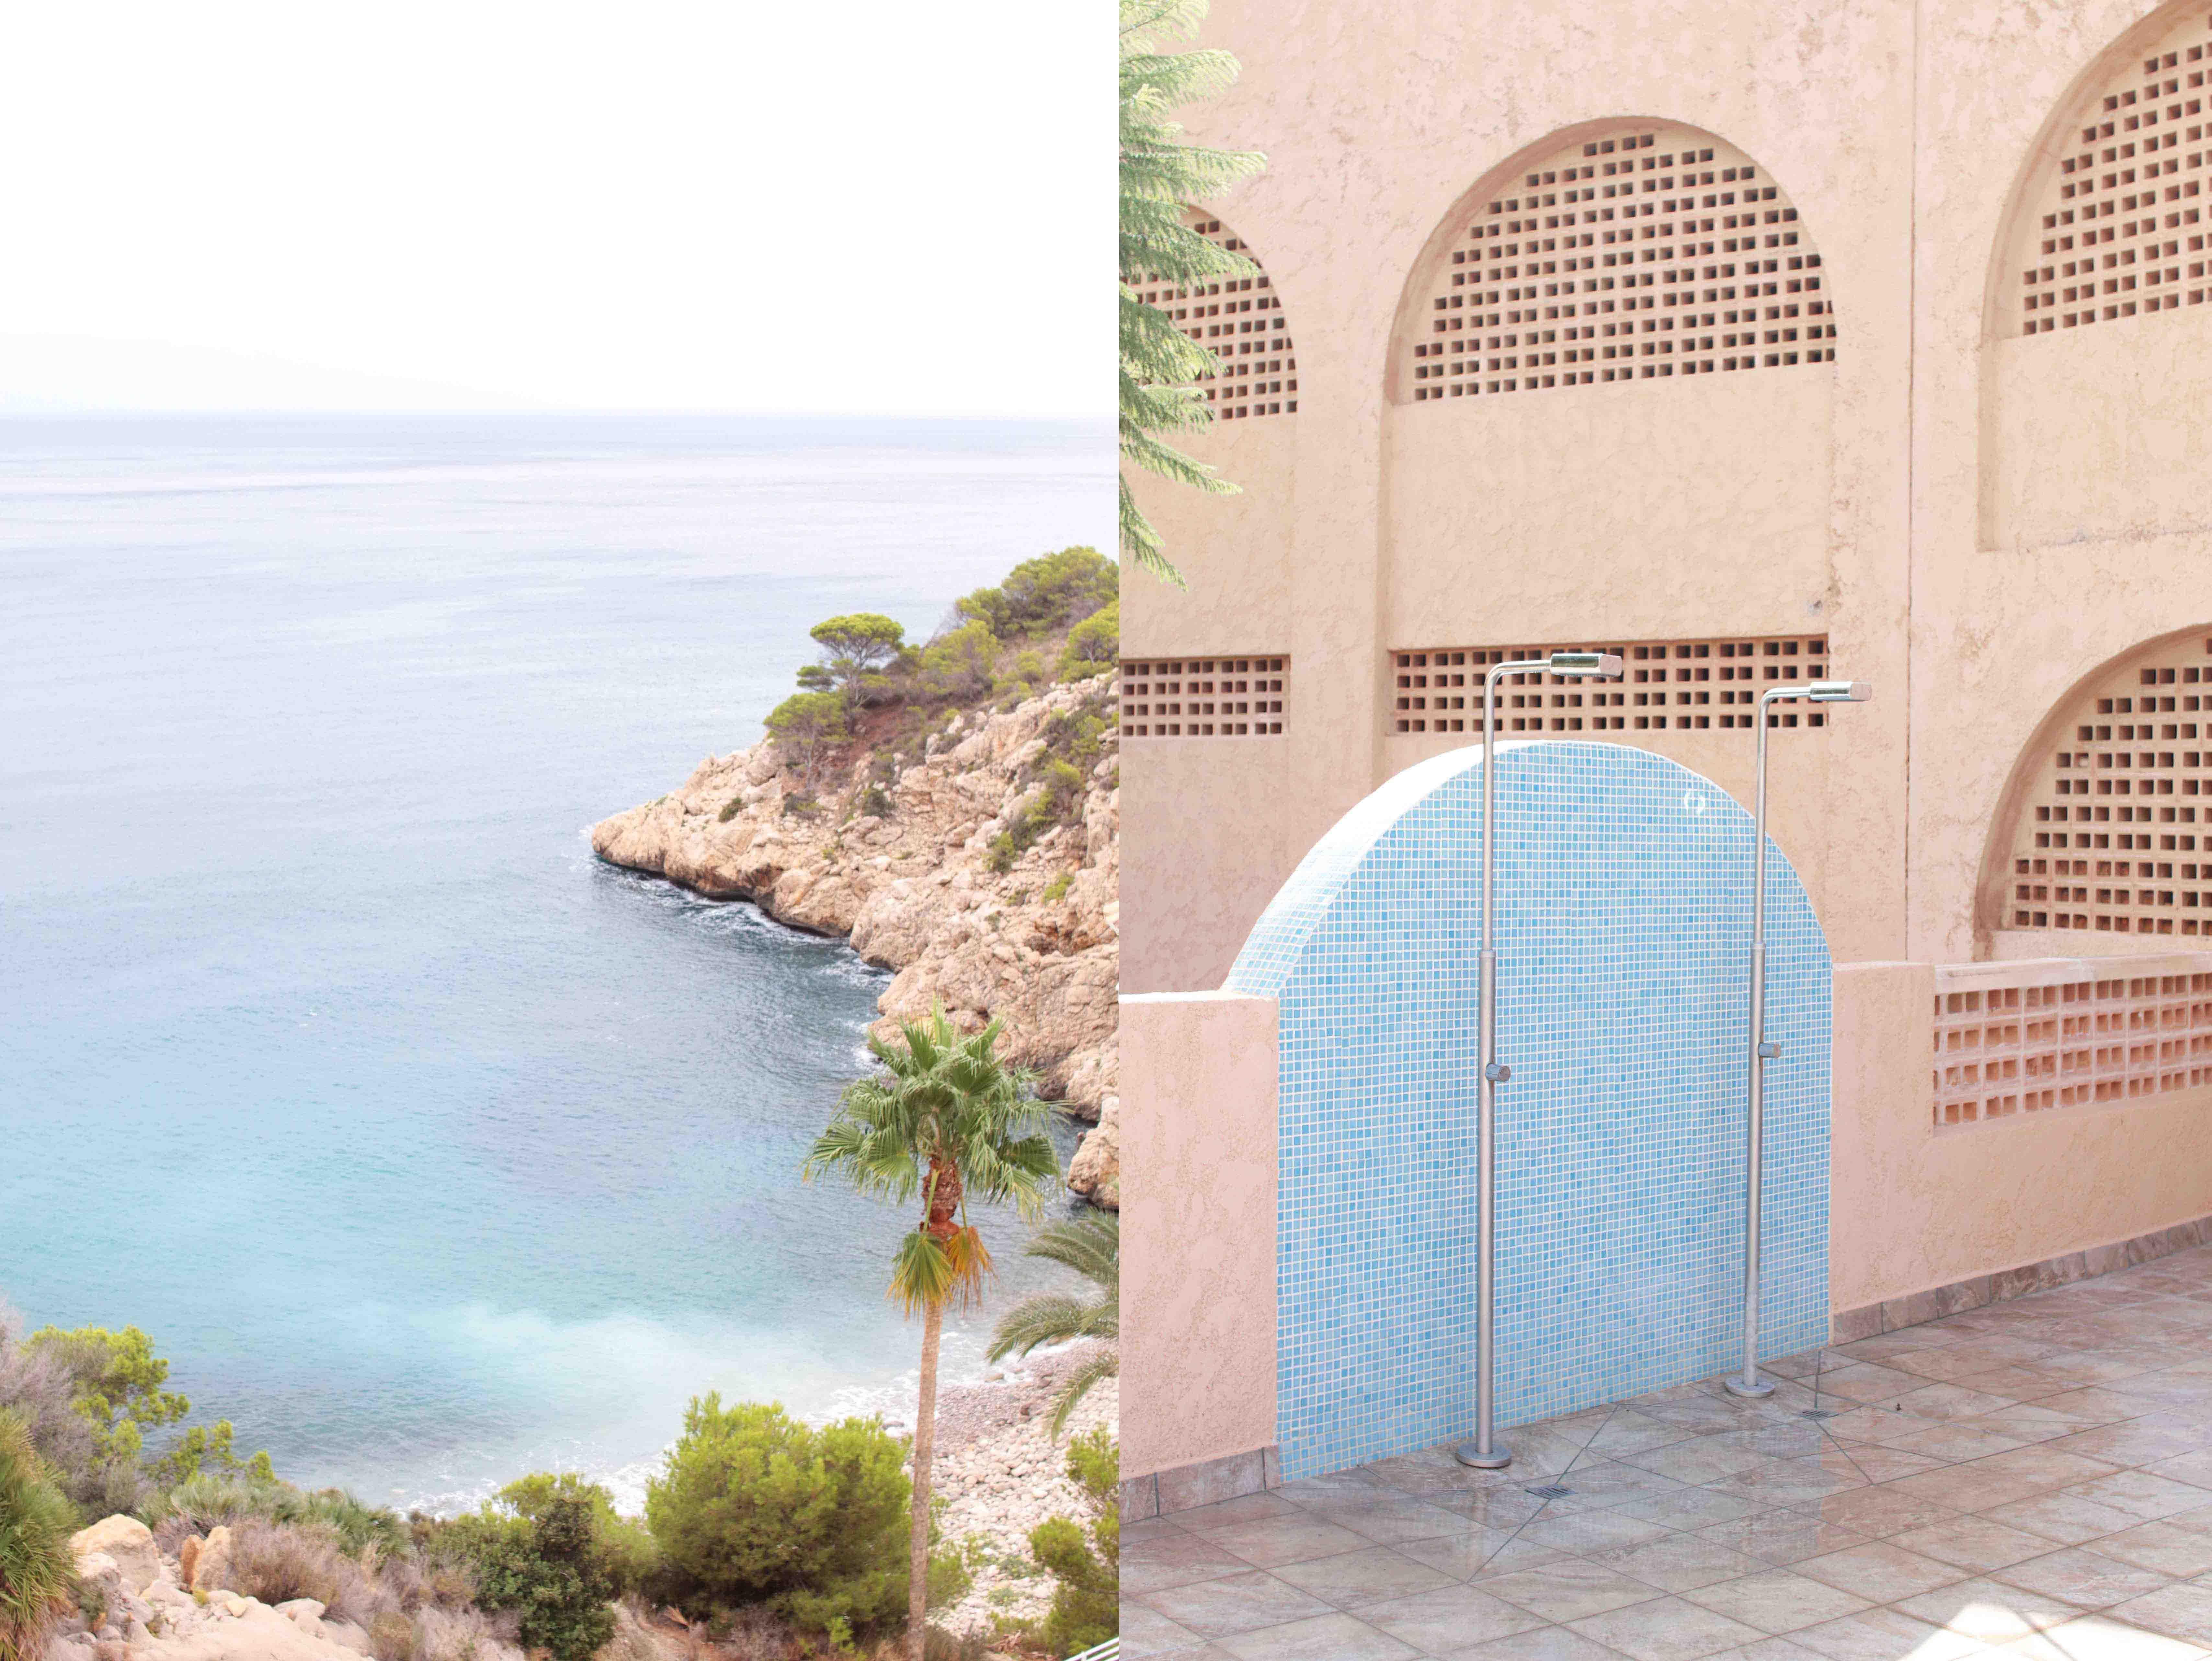 beach and pool sustainable swimwear by kyra de vreeze kyraskitchen